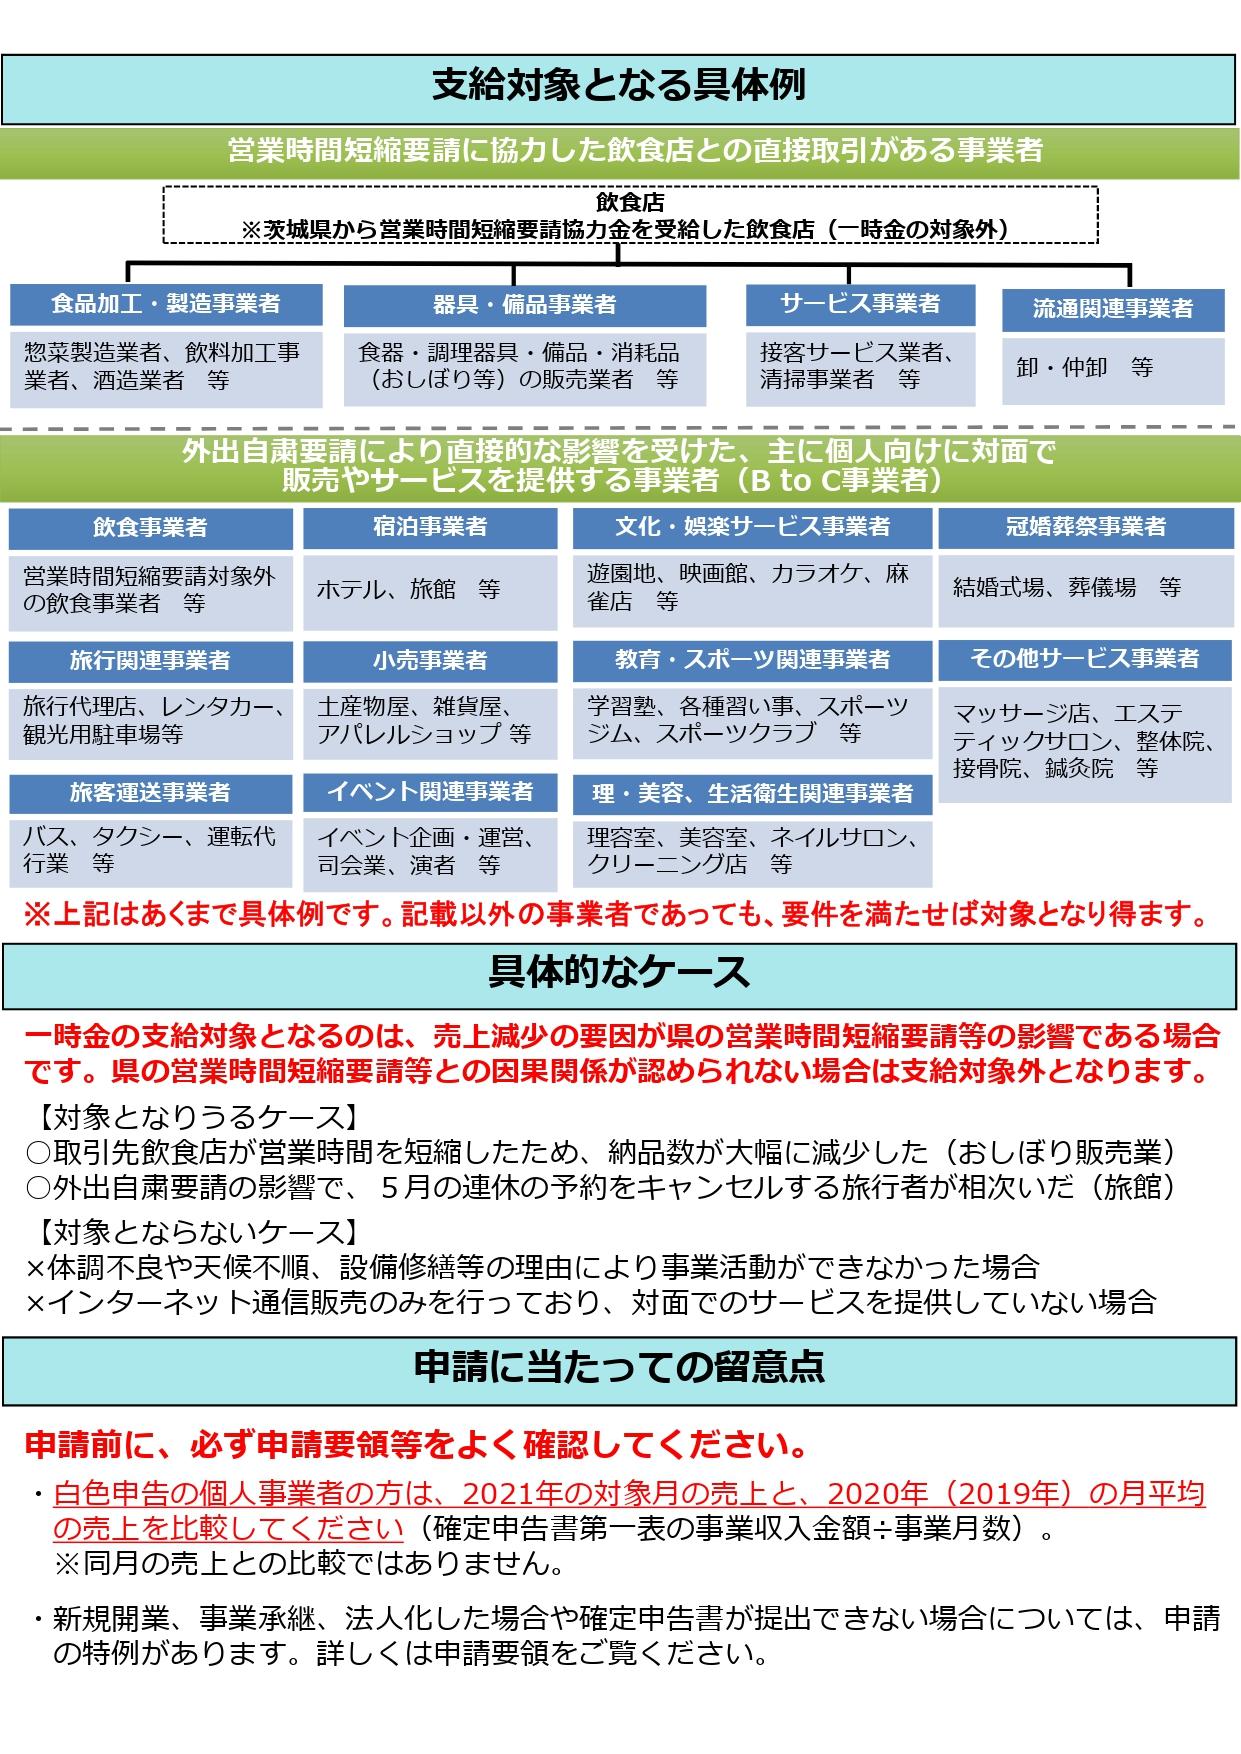 ichijikin_flyer_2106_page0002.jpg